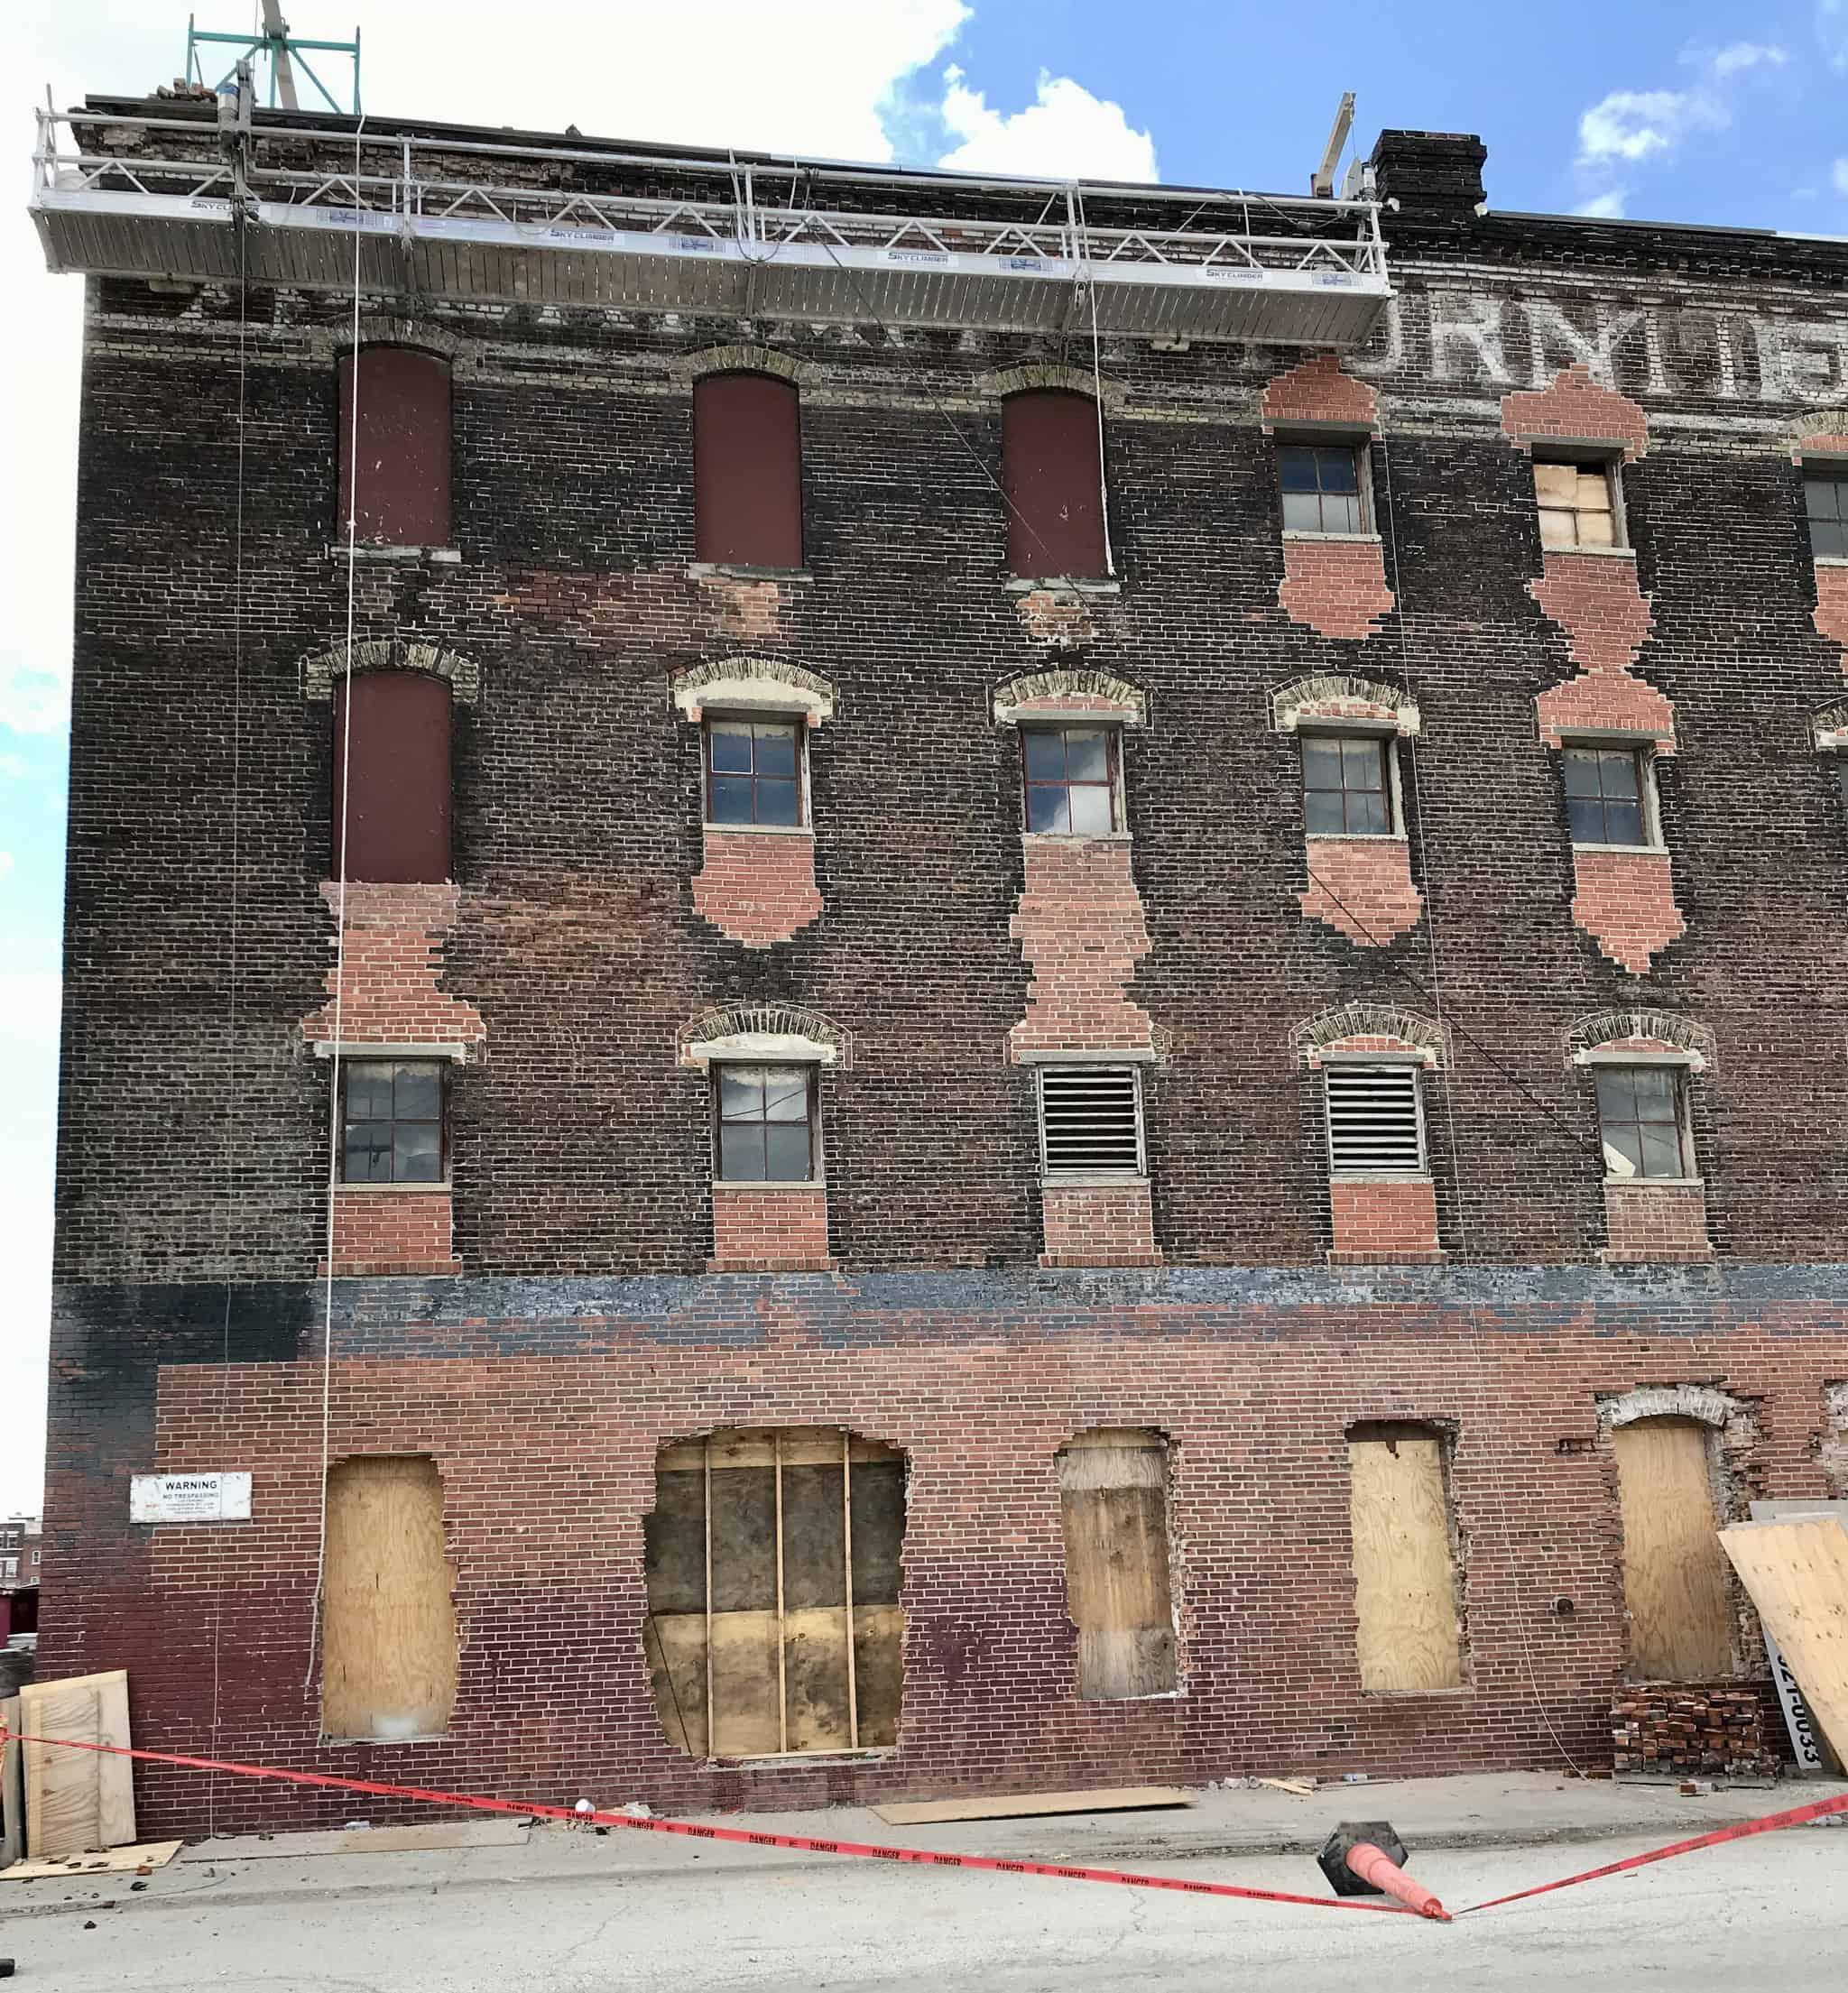 Abernathy Building restoration in Kansas City's West Bottoms industrial district.